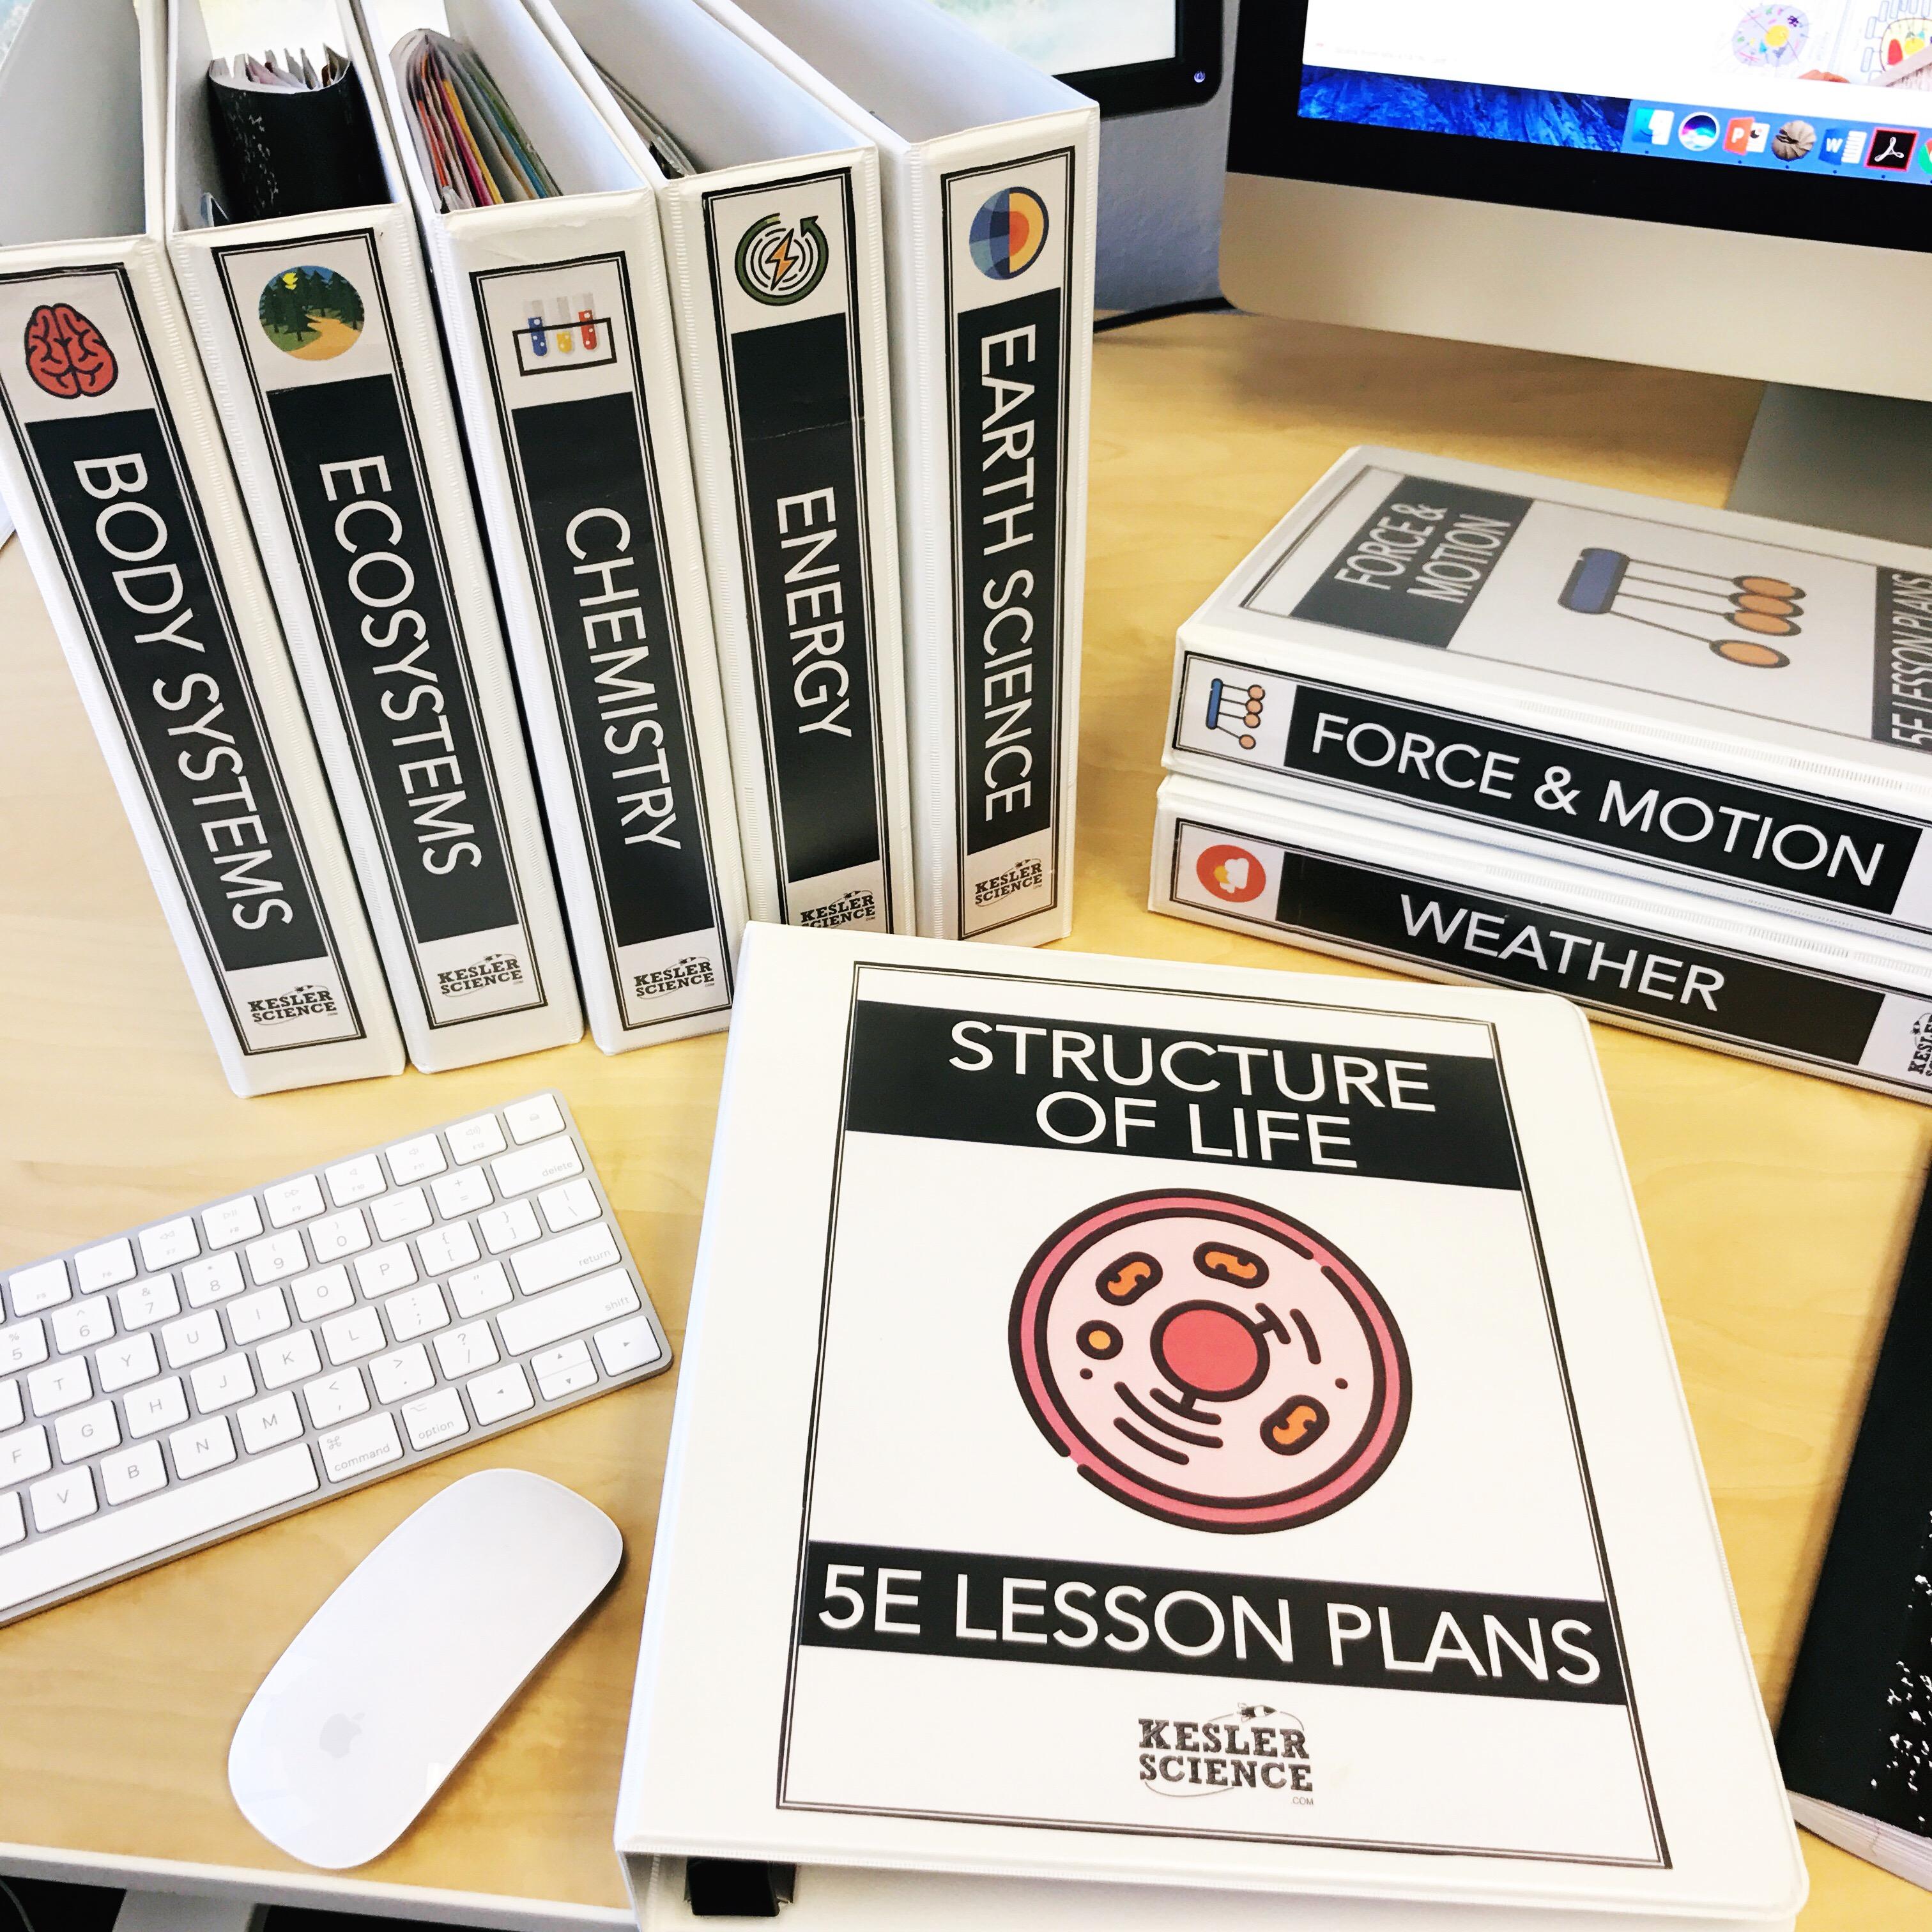 5E Lessons